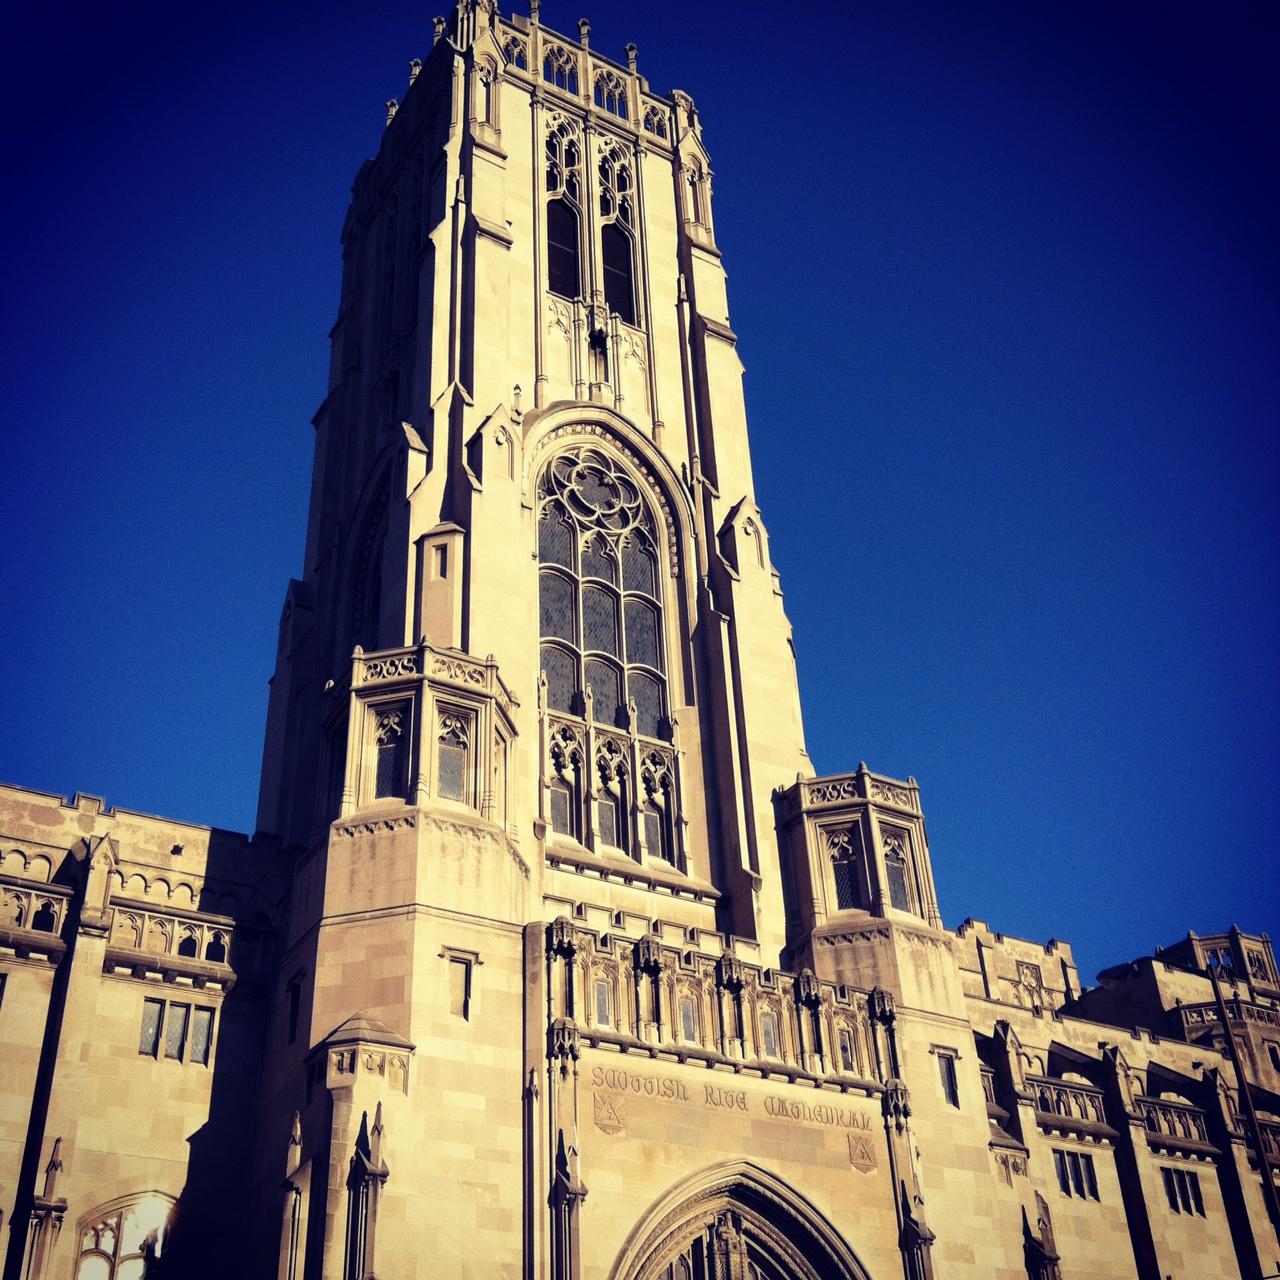 Friday Favorite: 6 Trivia Bits, Scottish Rite Cathedral